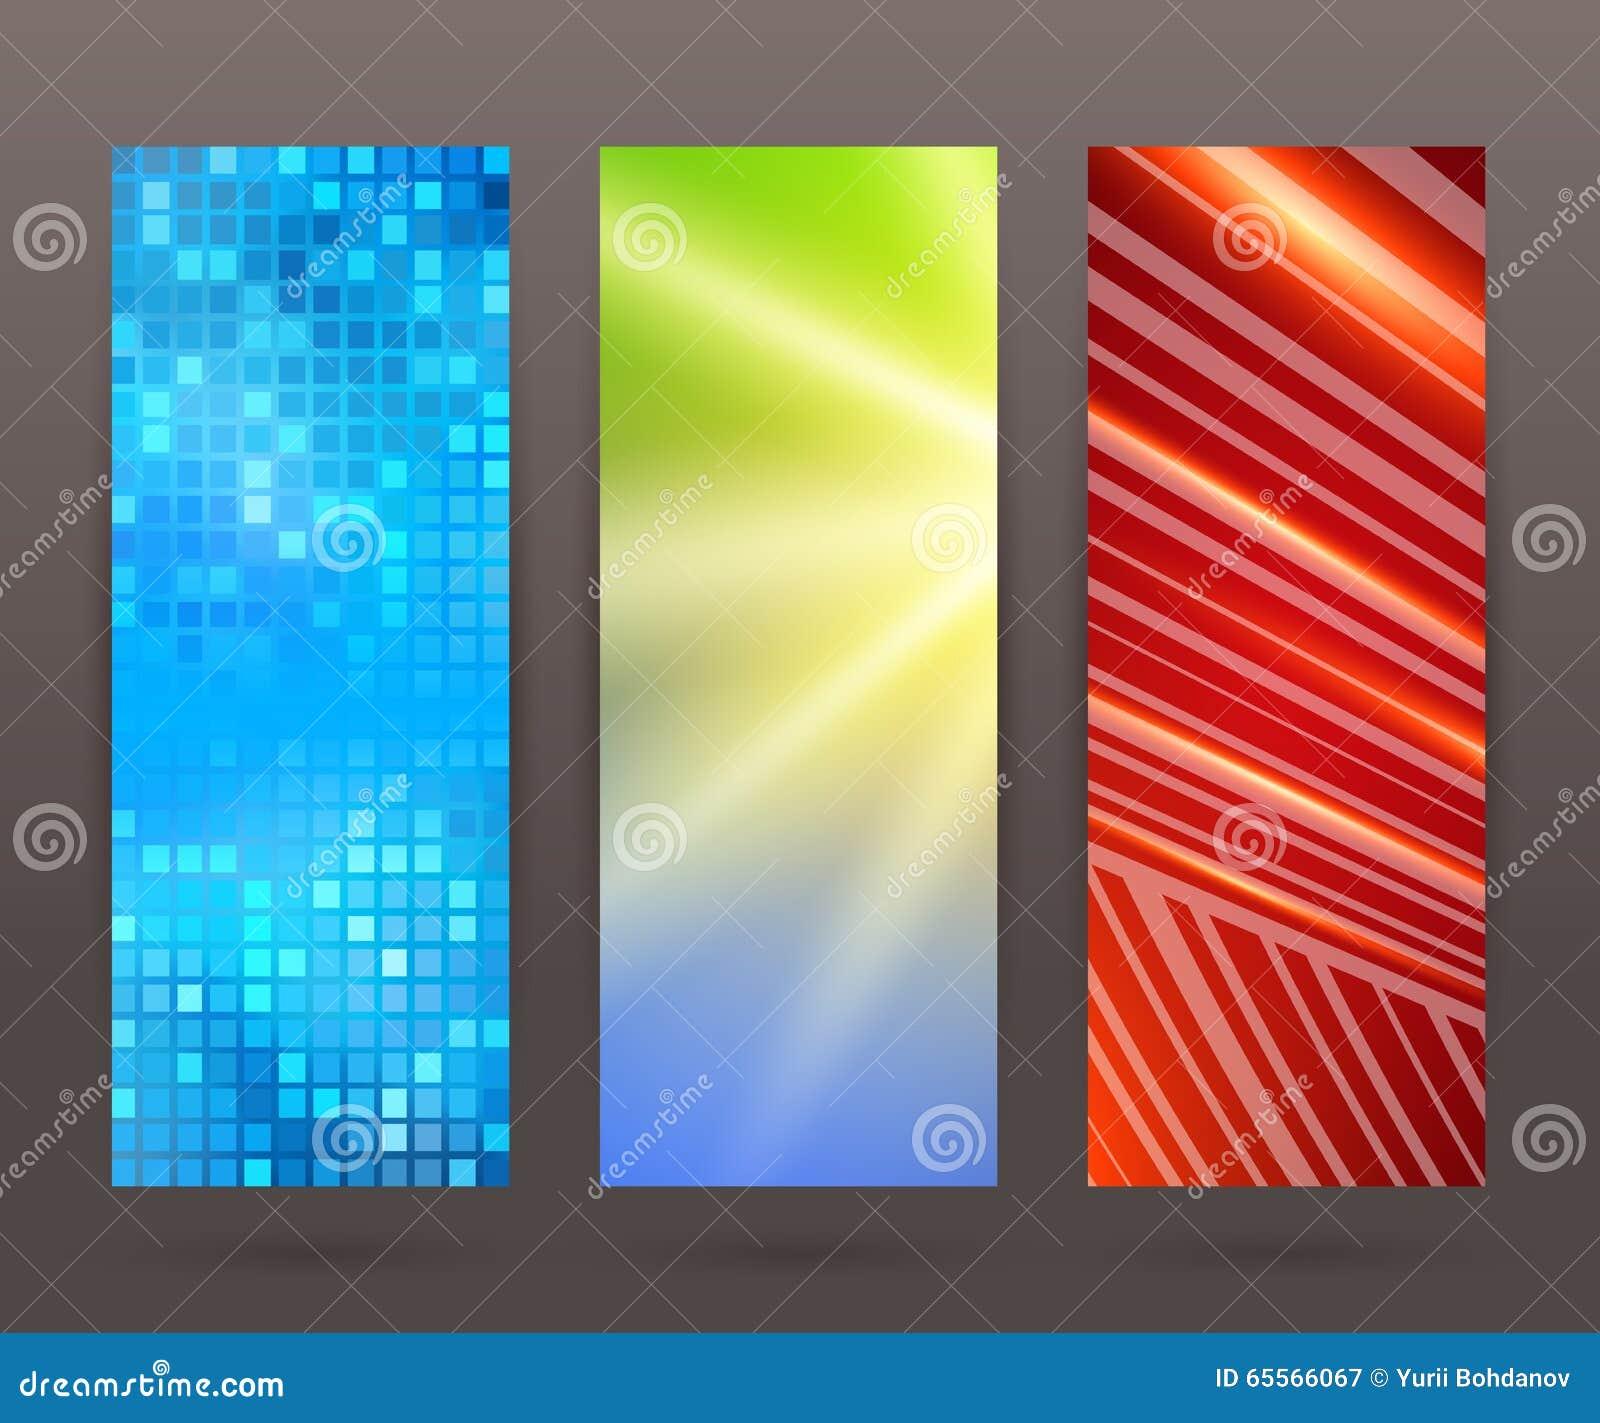 Vertical Design Number Banners Template Stock Illustration - Image ...